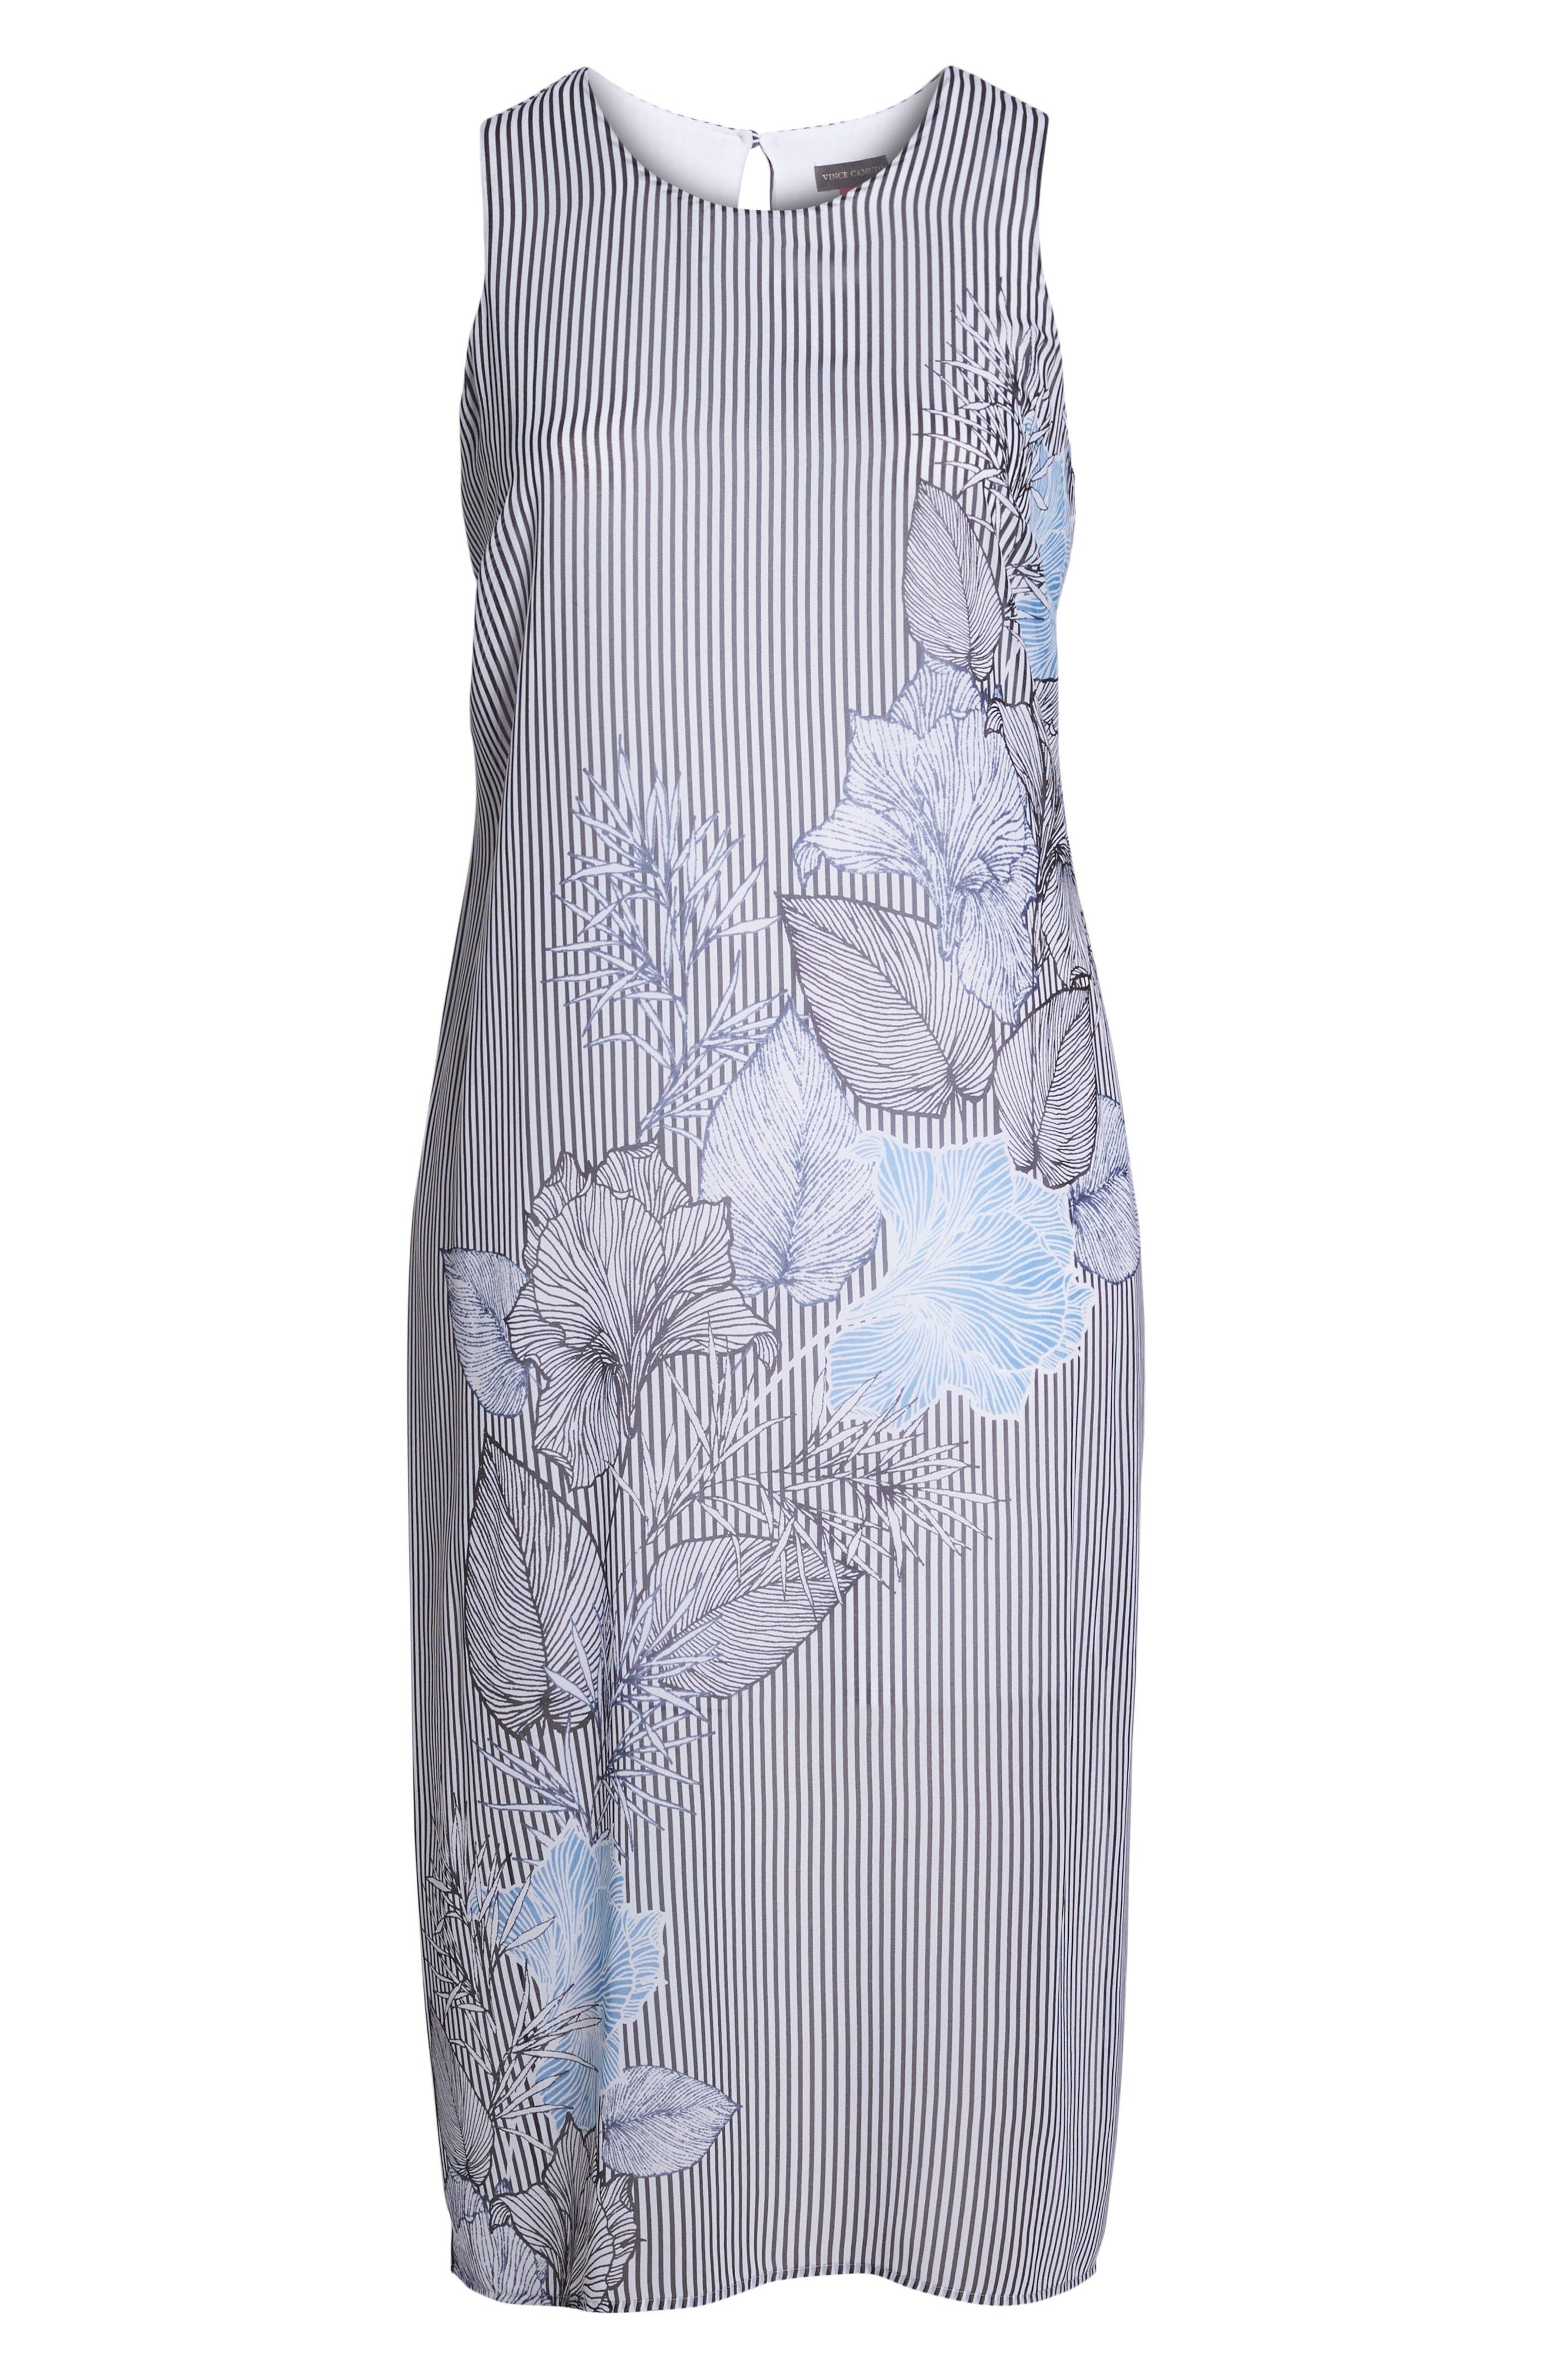 Island Floral Chiffon Maxi Dress,                             Alternate thumbnail 7, color,                             Rich Black